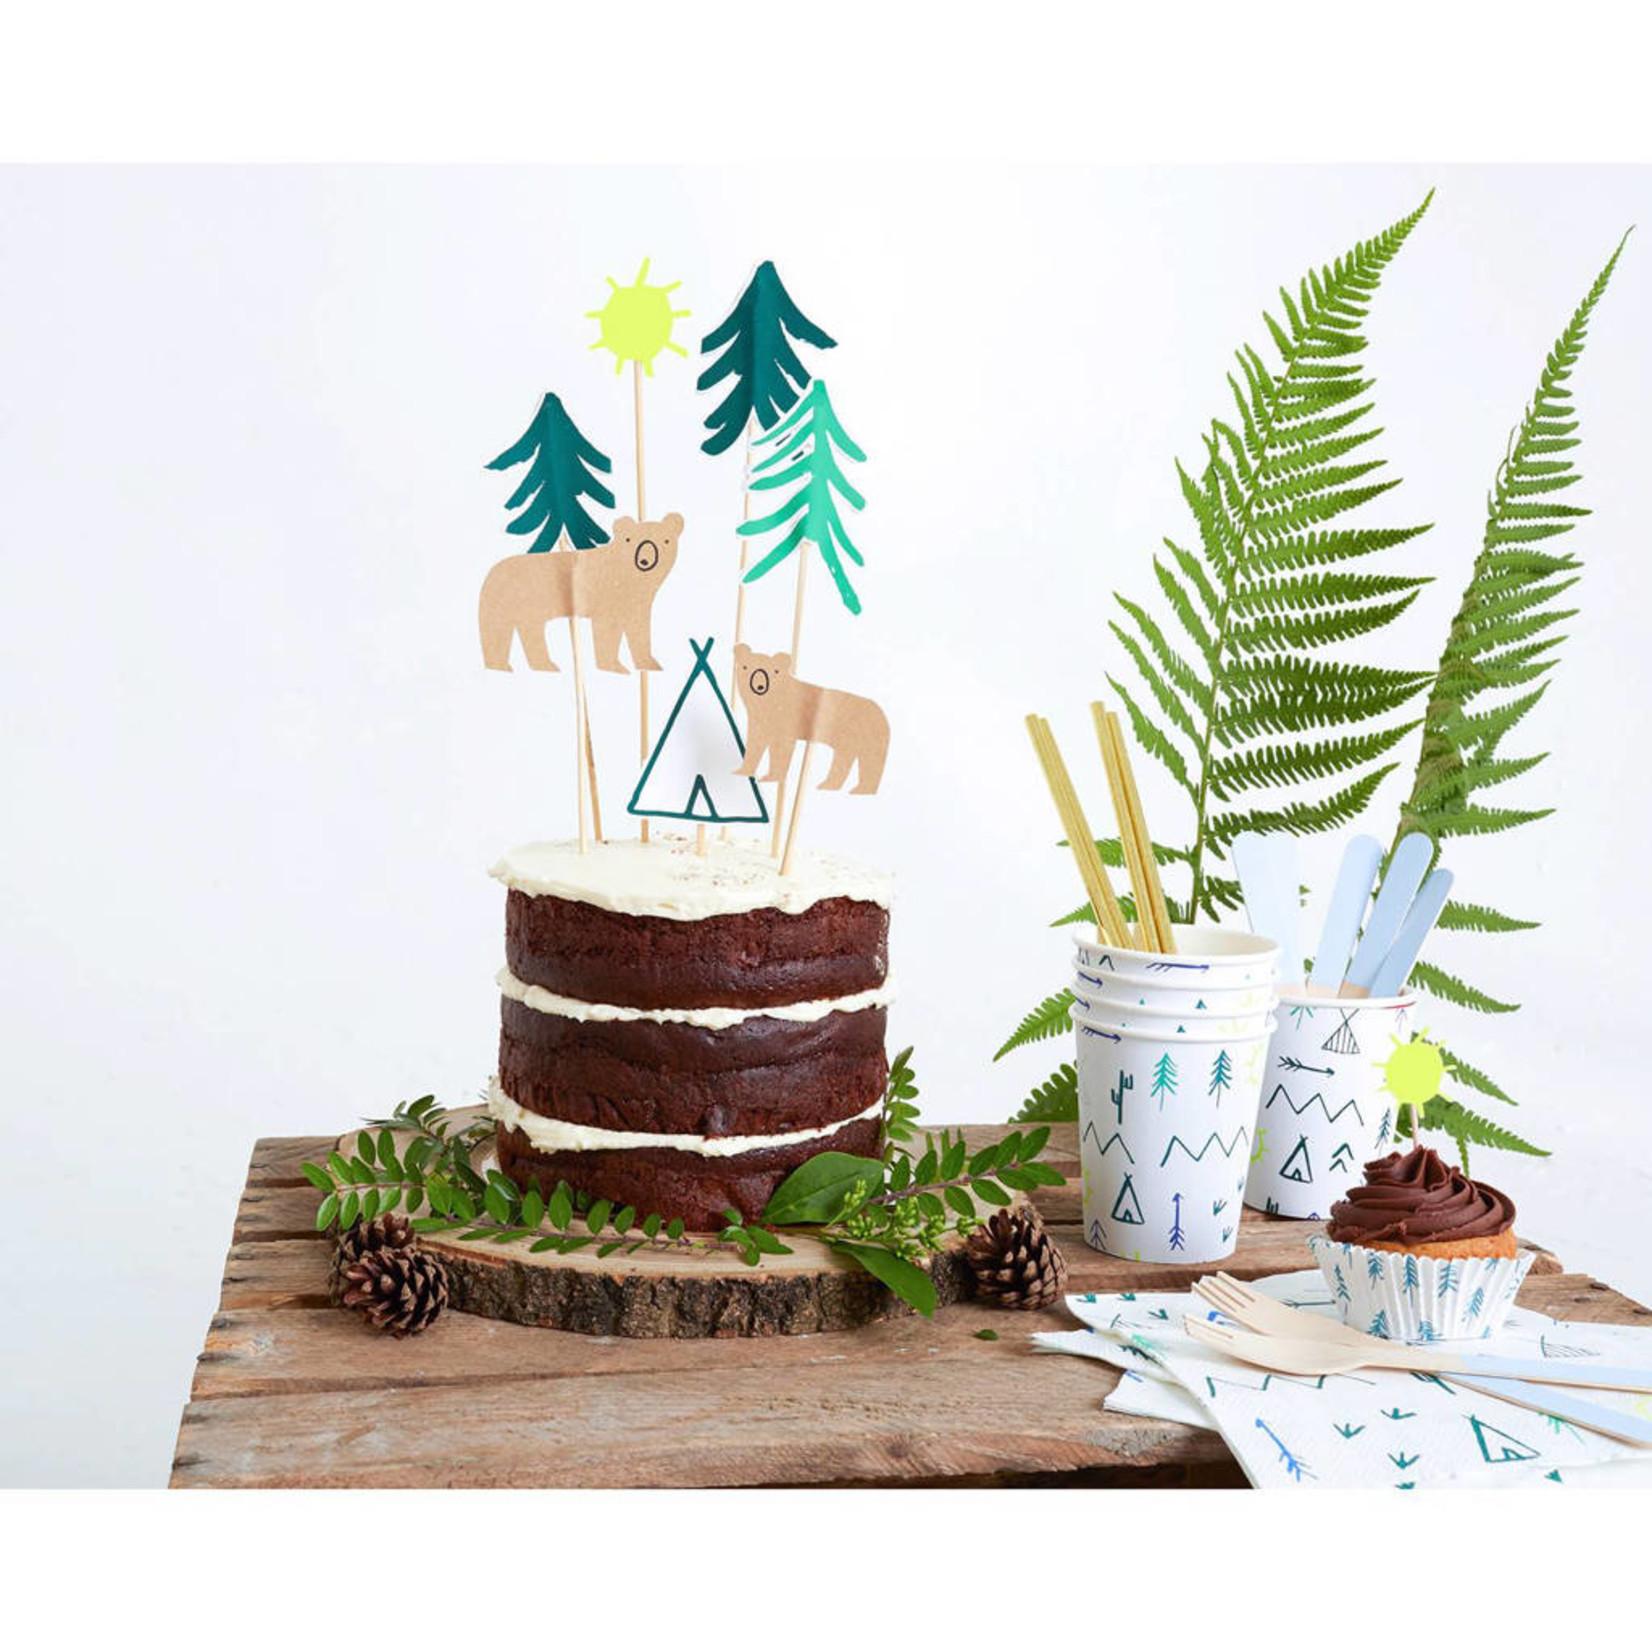 Letns Explore Cake